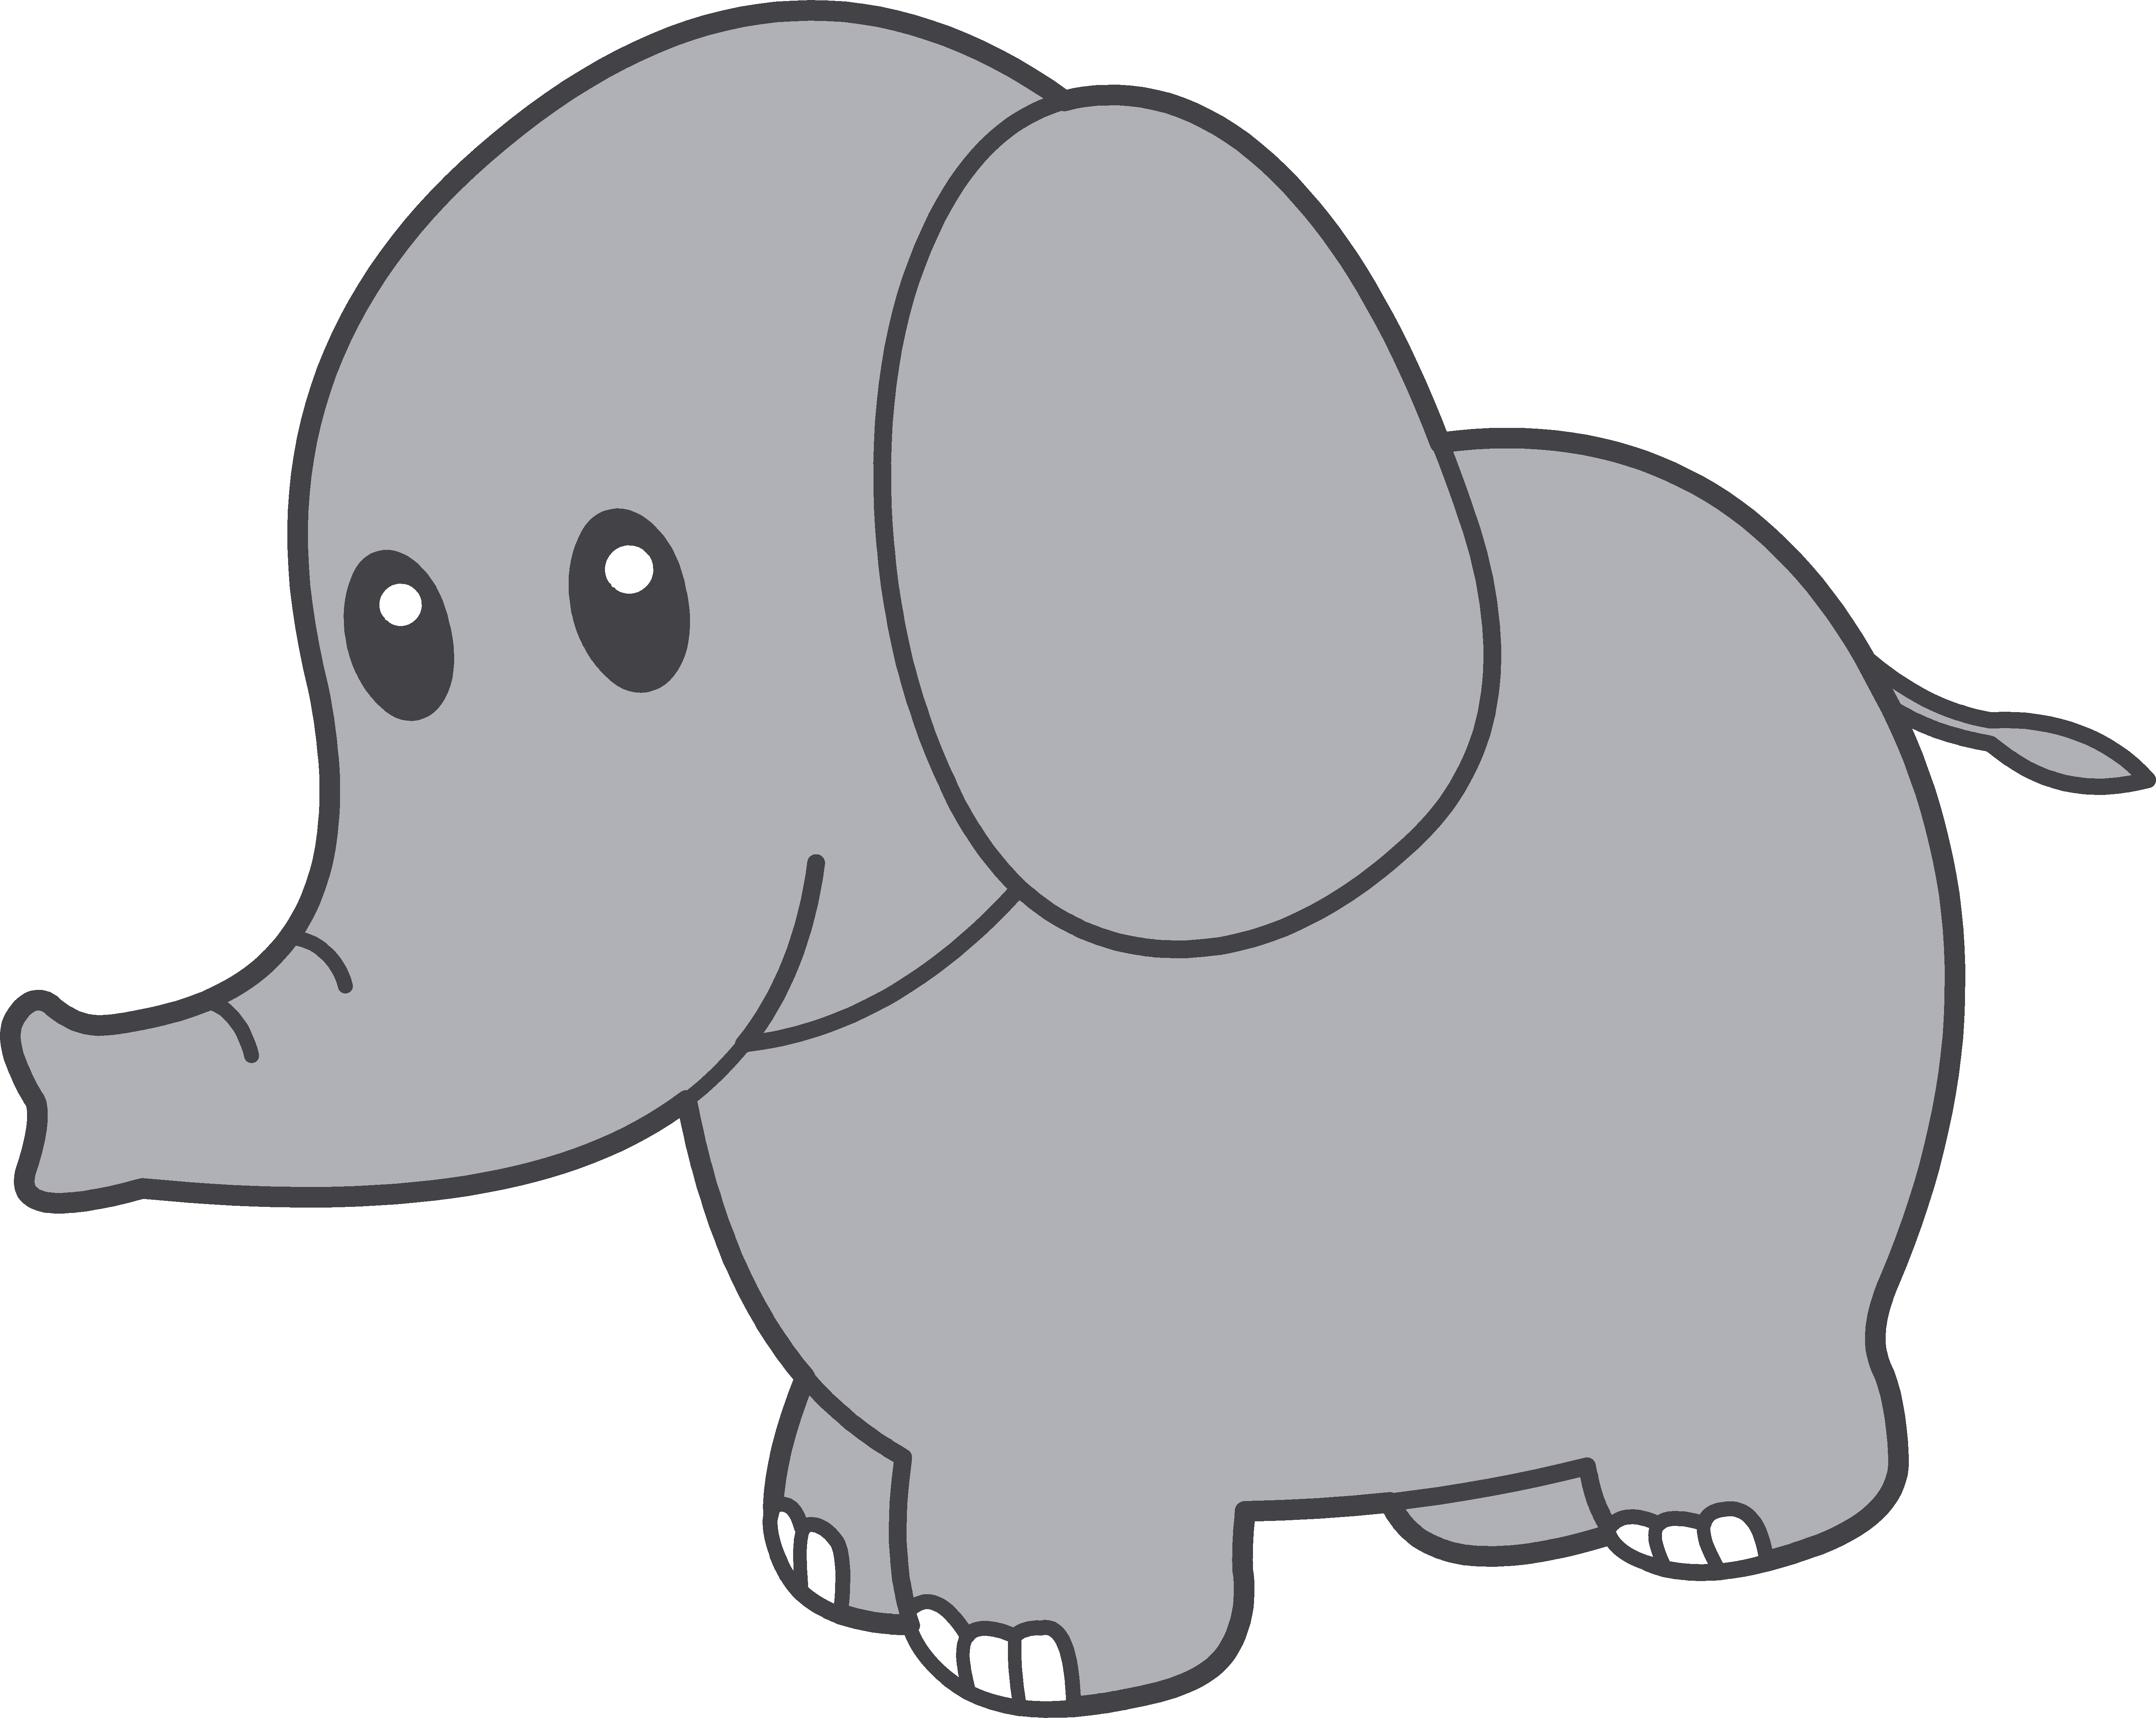 Elephant following elephant clipart image transparent library Elephant following elephant clipart - ClipartFest image transparent library